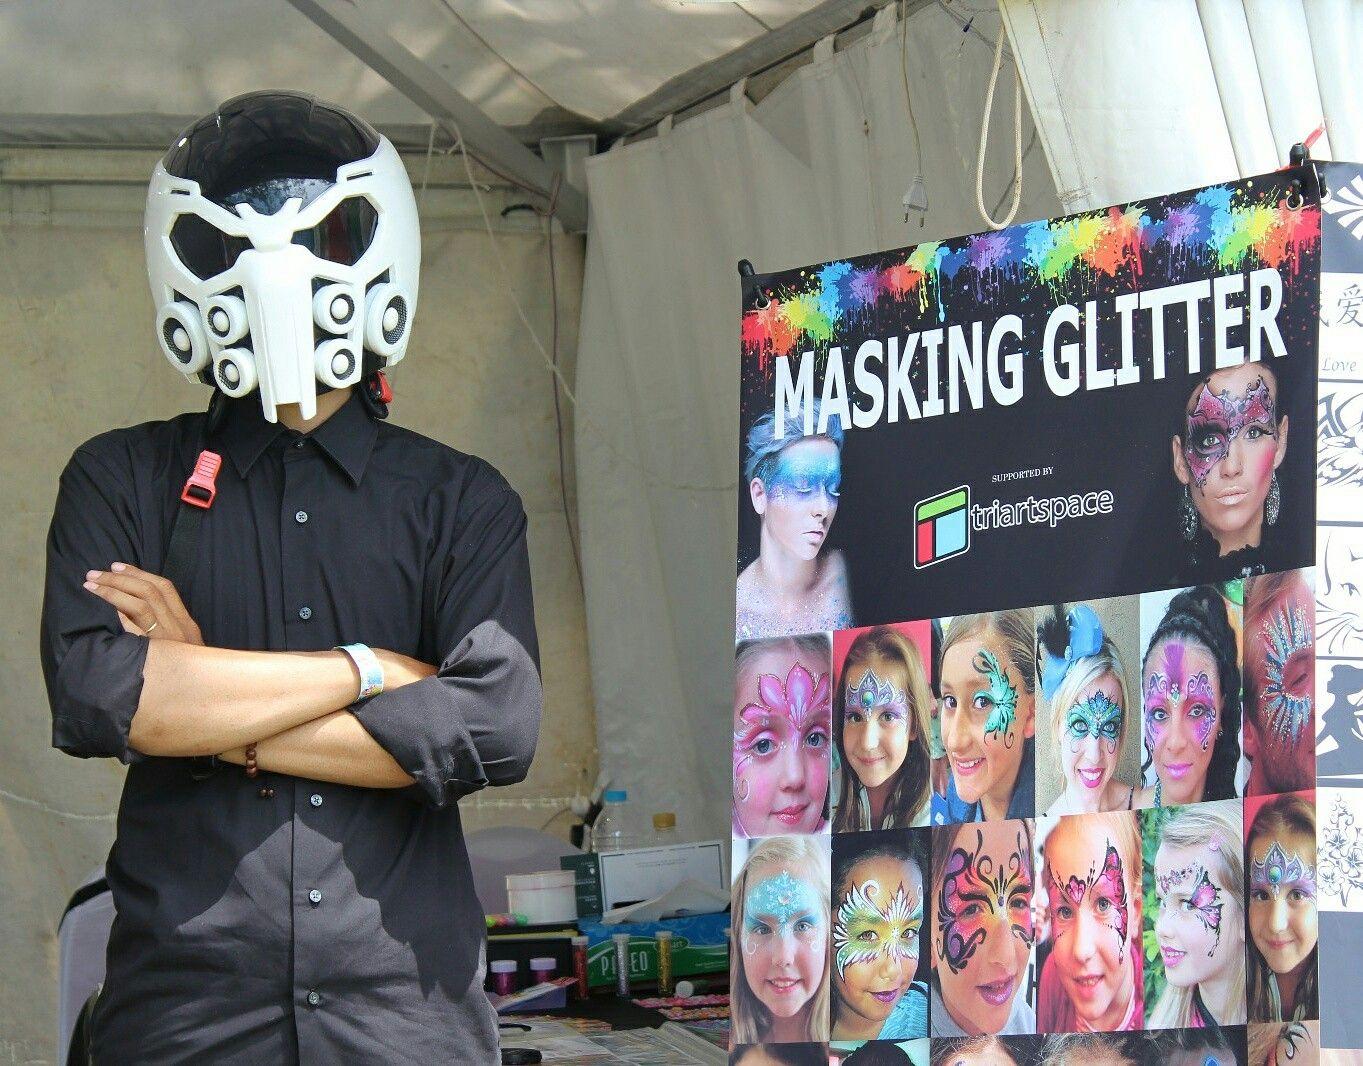 Masking Glitter Jakarta Bu face Painting Jakarta. Just